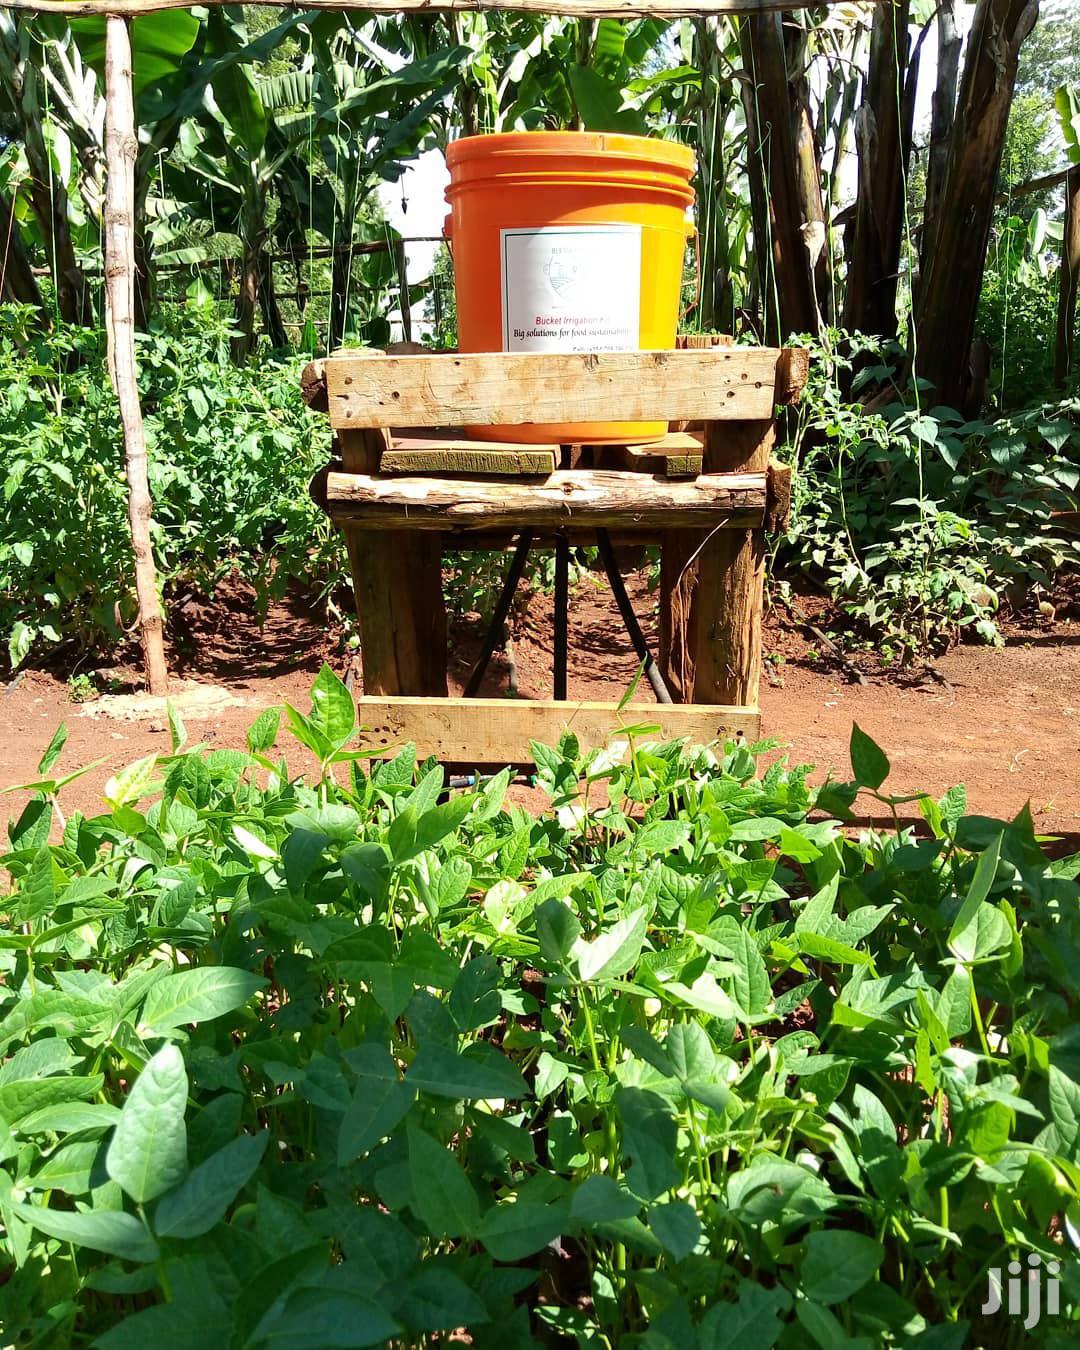 Bucket Irrigation Kit | Farm Machinery & Equipment for sale in Ndumberi, Kiambu, Kenya